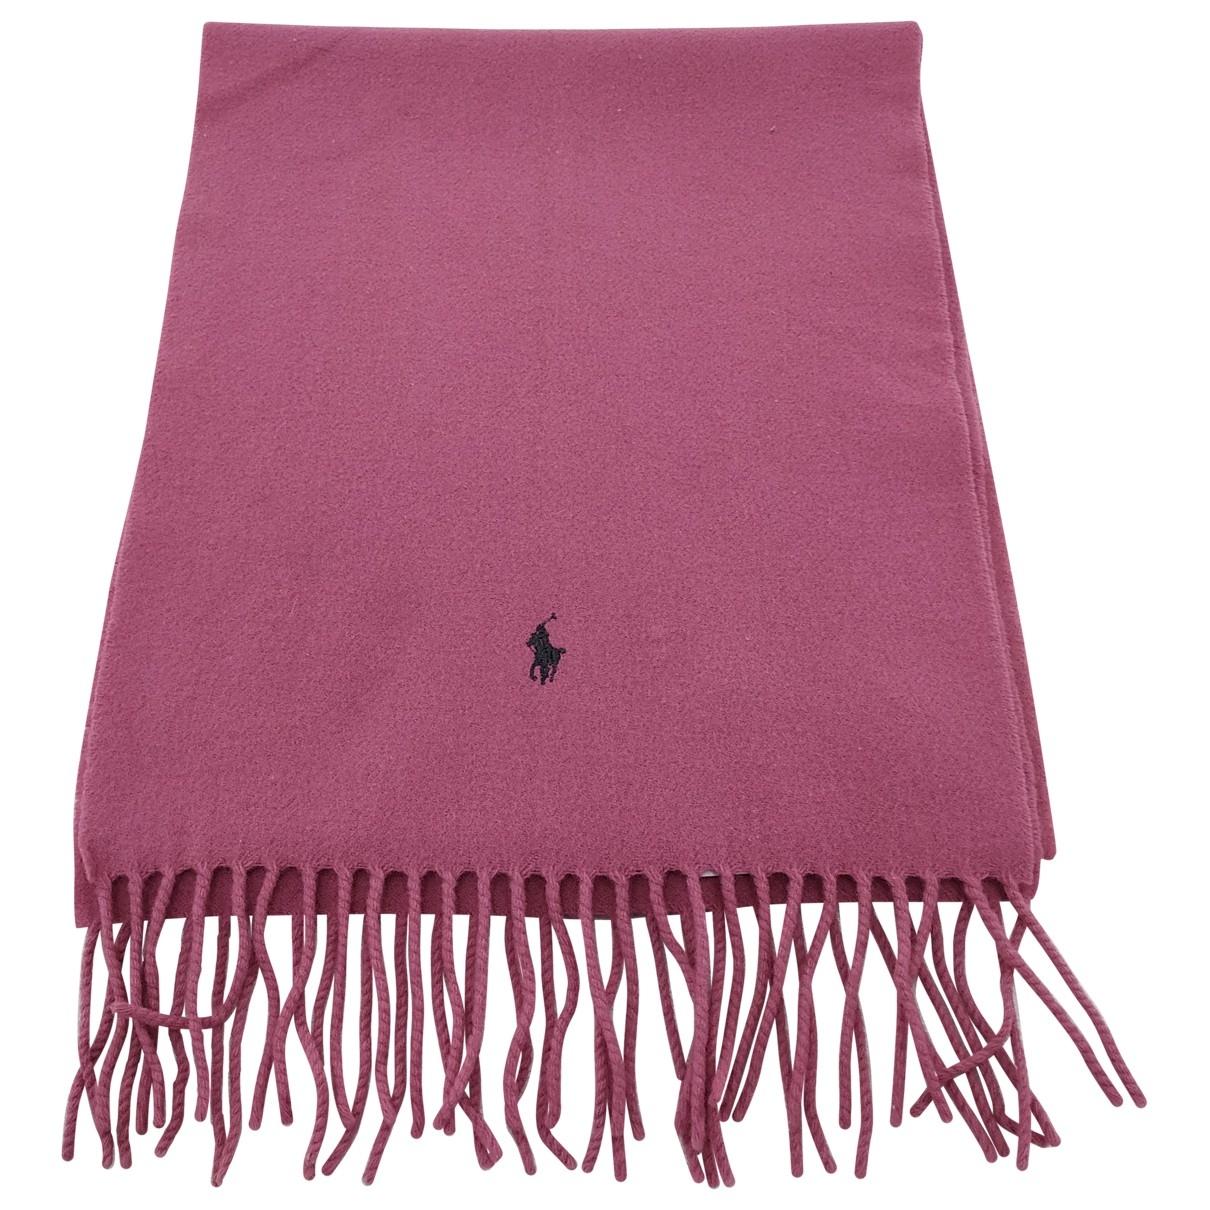 Polo Ralph Lauren \N Pink Wool scarf for Women \N